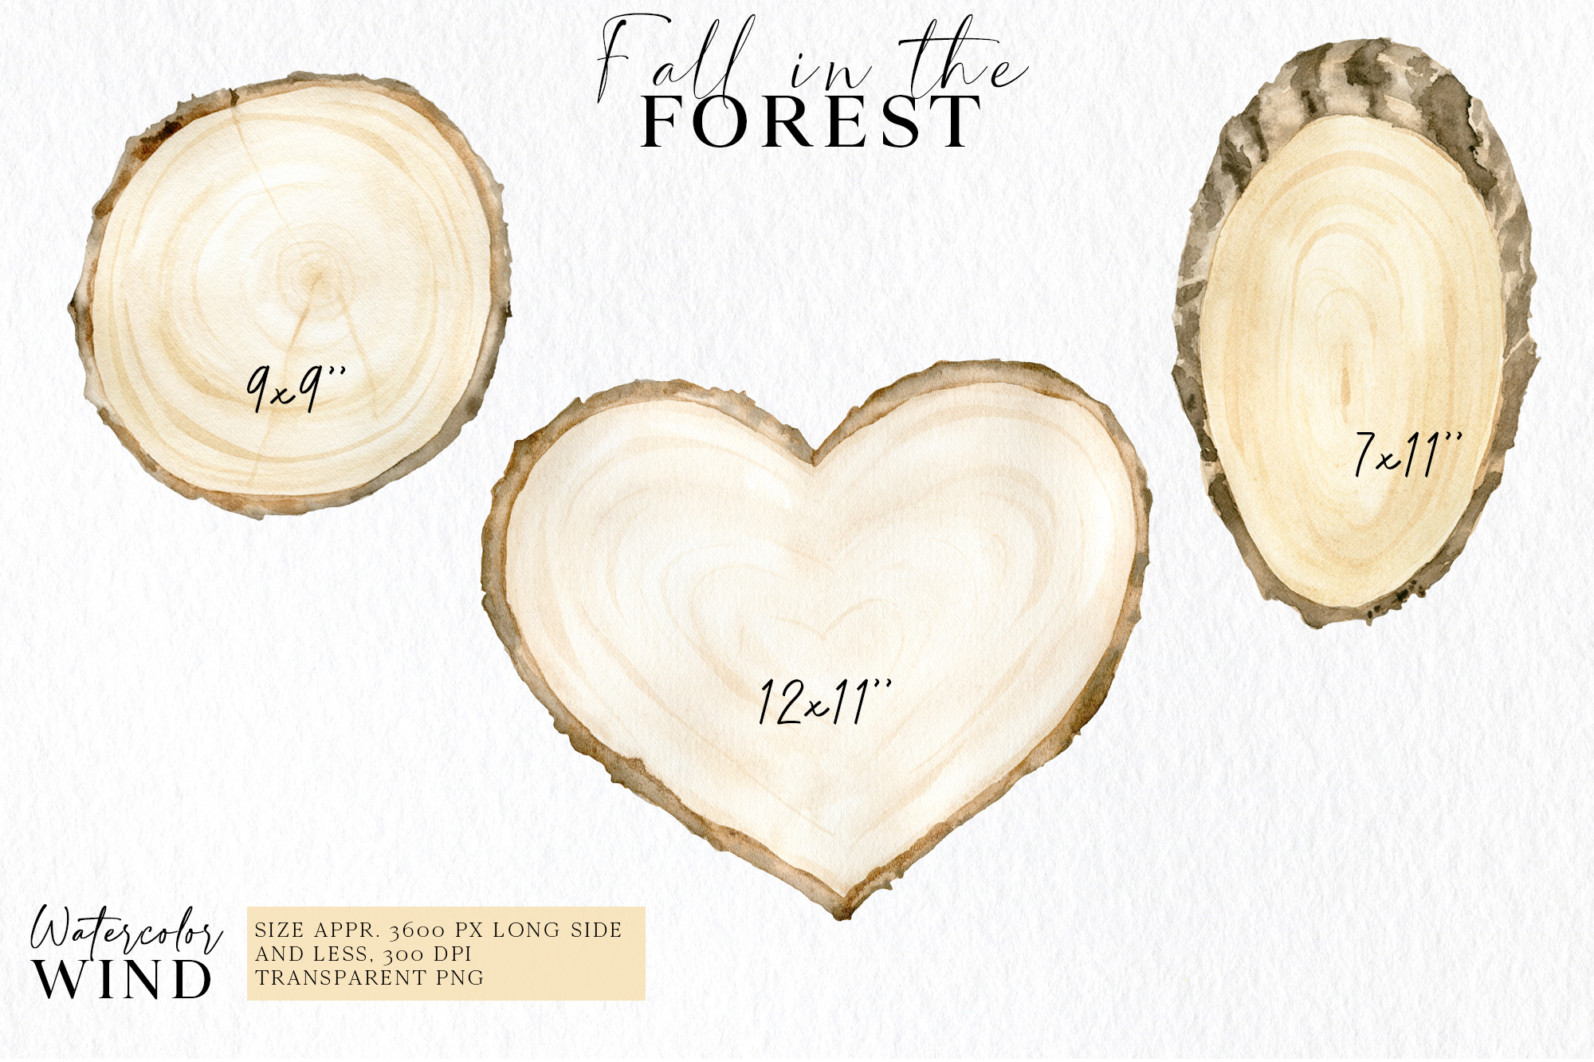 Fall forest mushrooms clipart, autumn clip art - 02 11 -